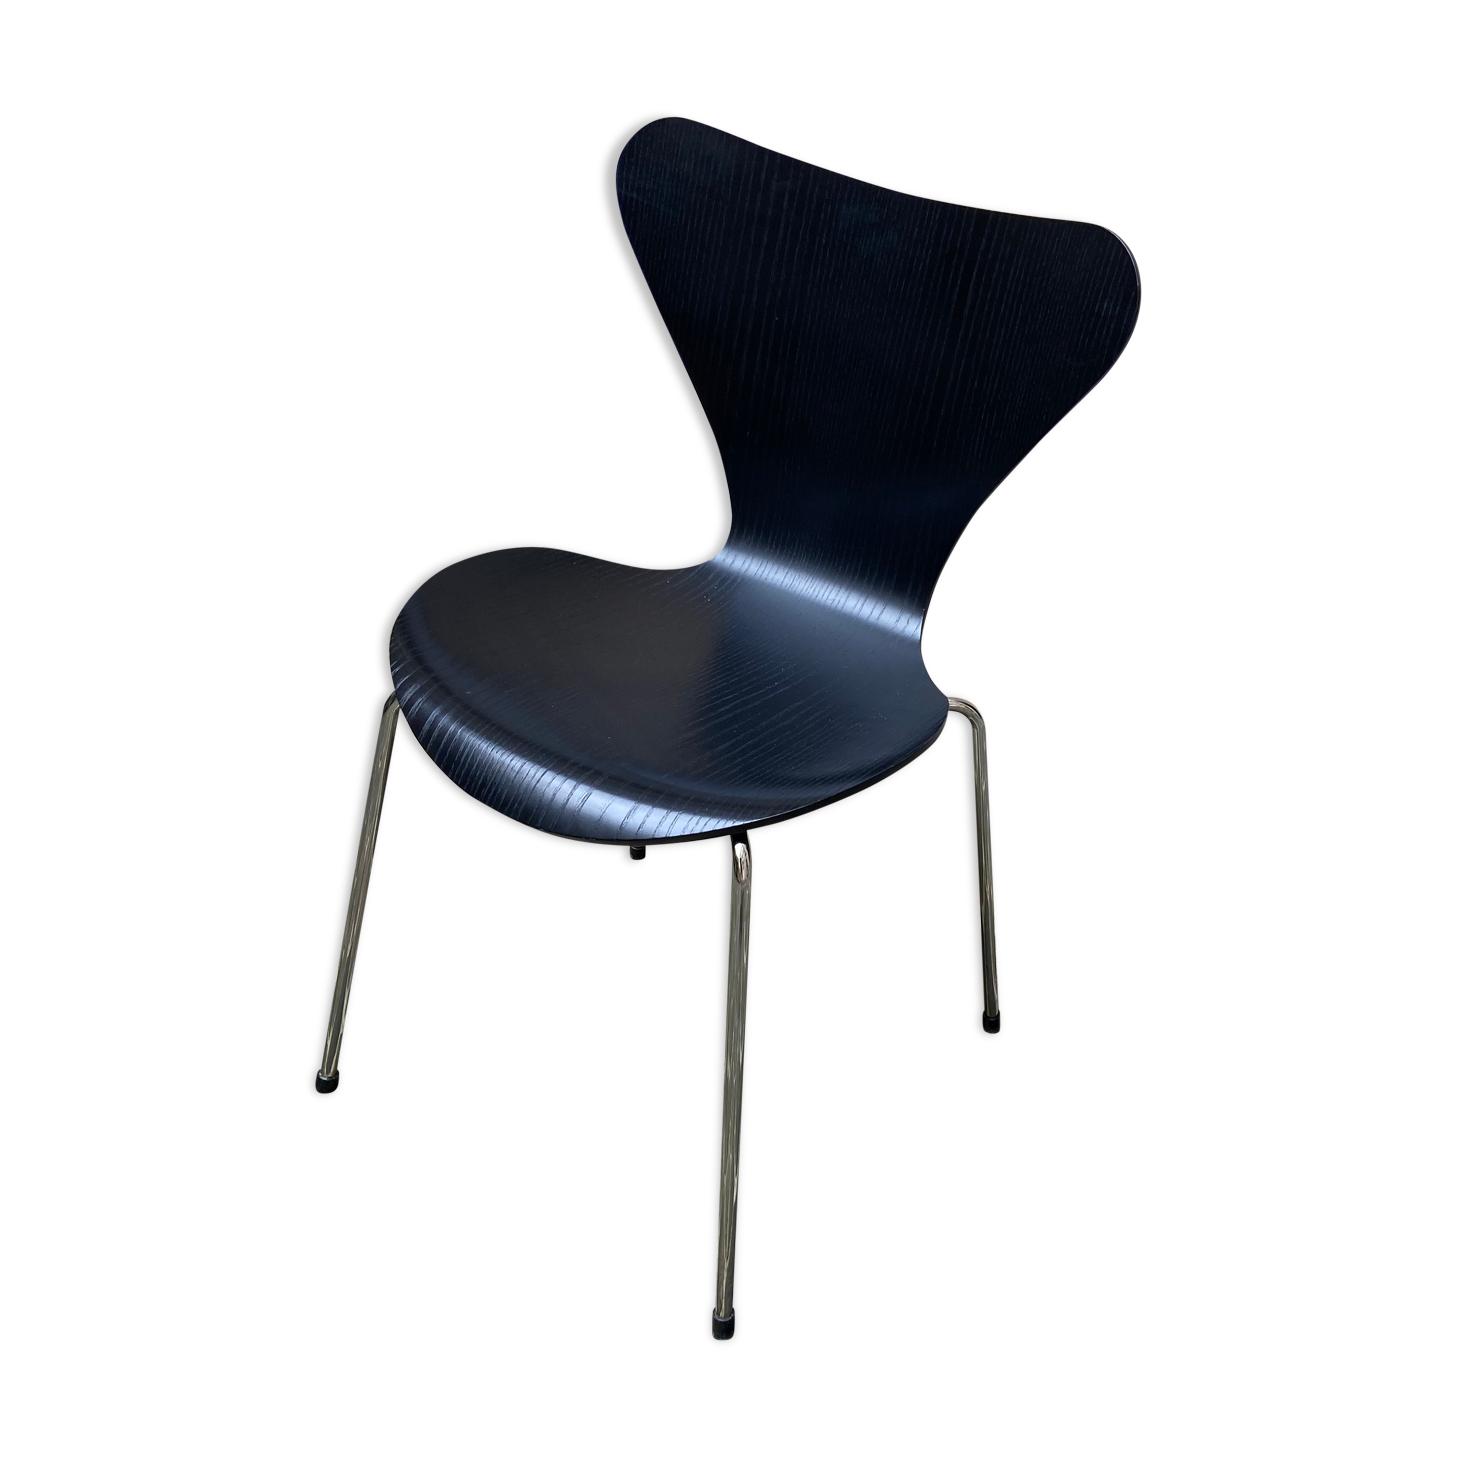 Chaise 3107 d'Arne Jacobsen